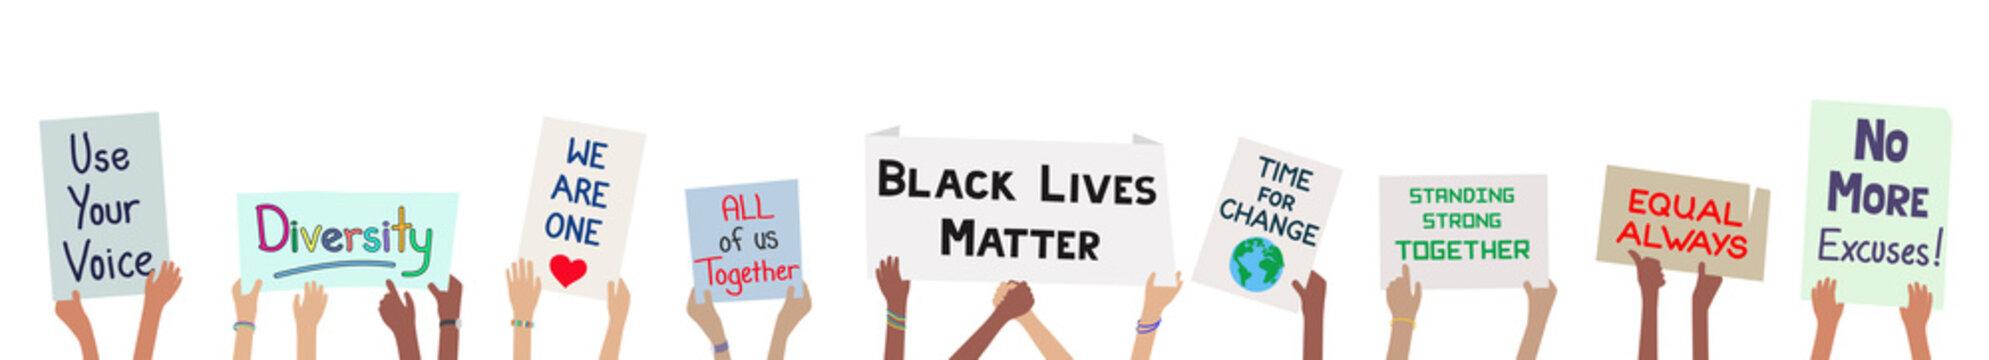 Black lives matter children holding signs to protest for justice banner